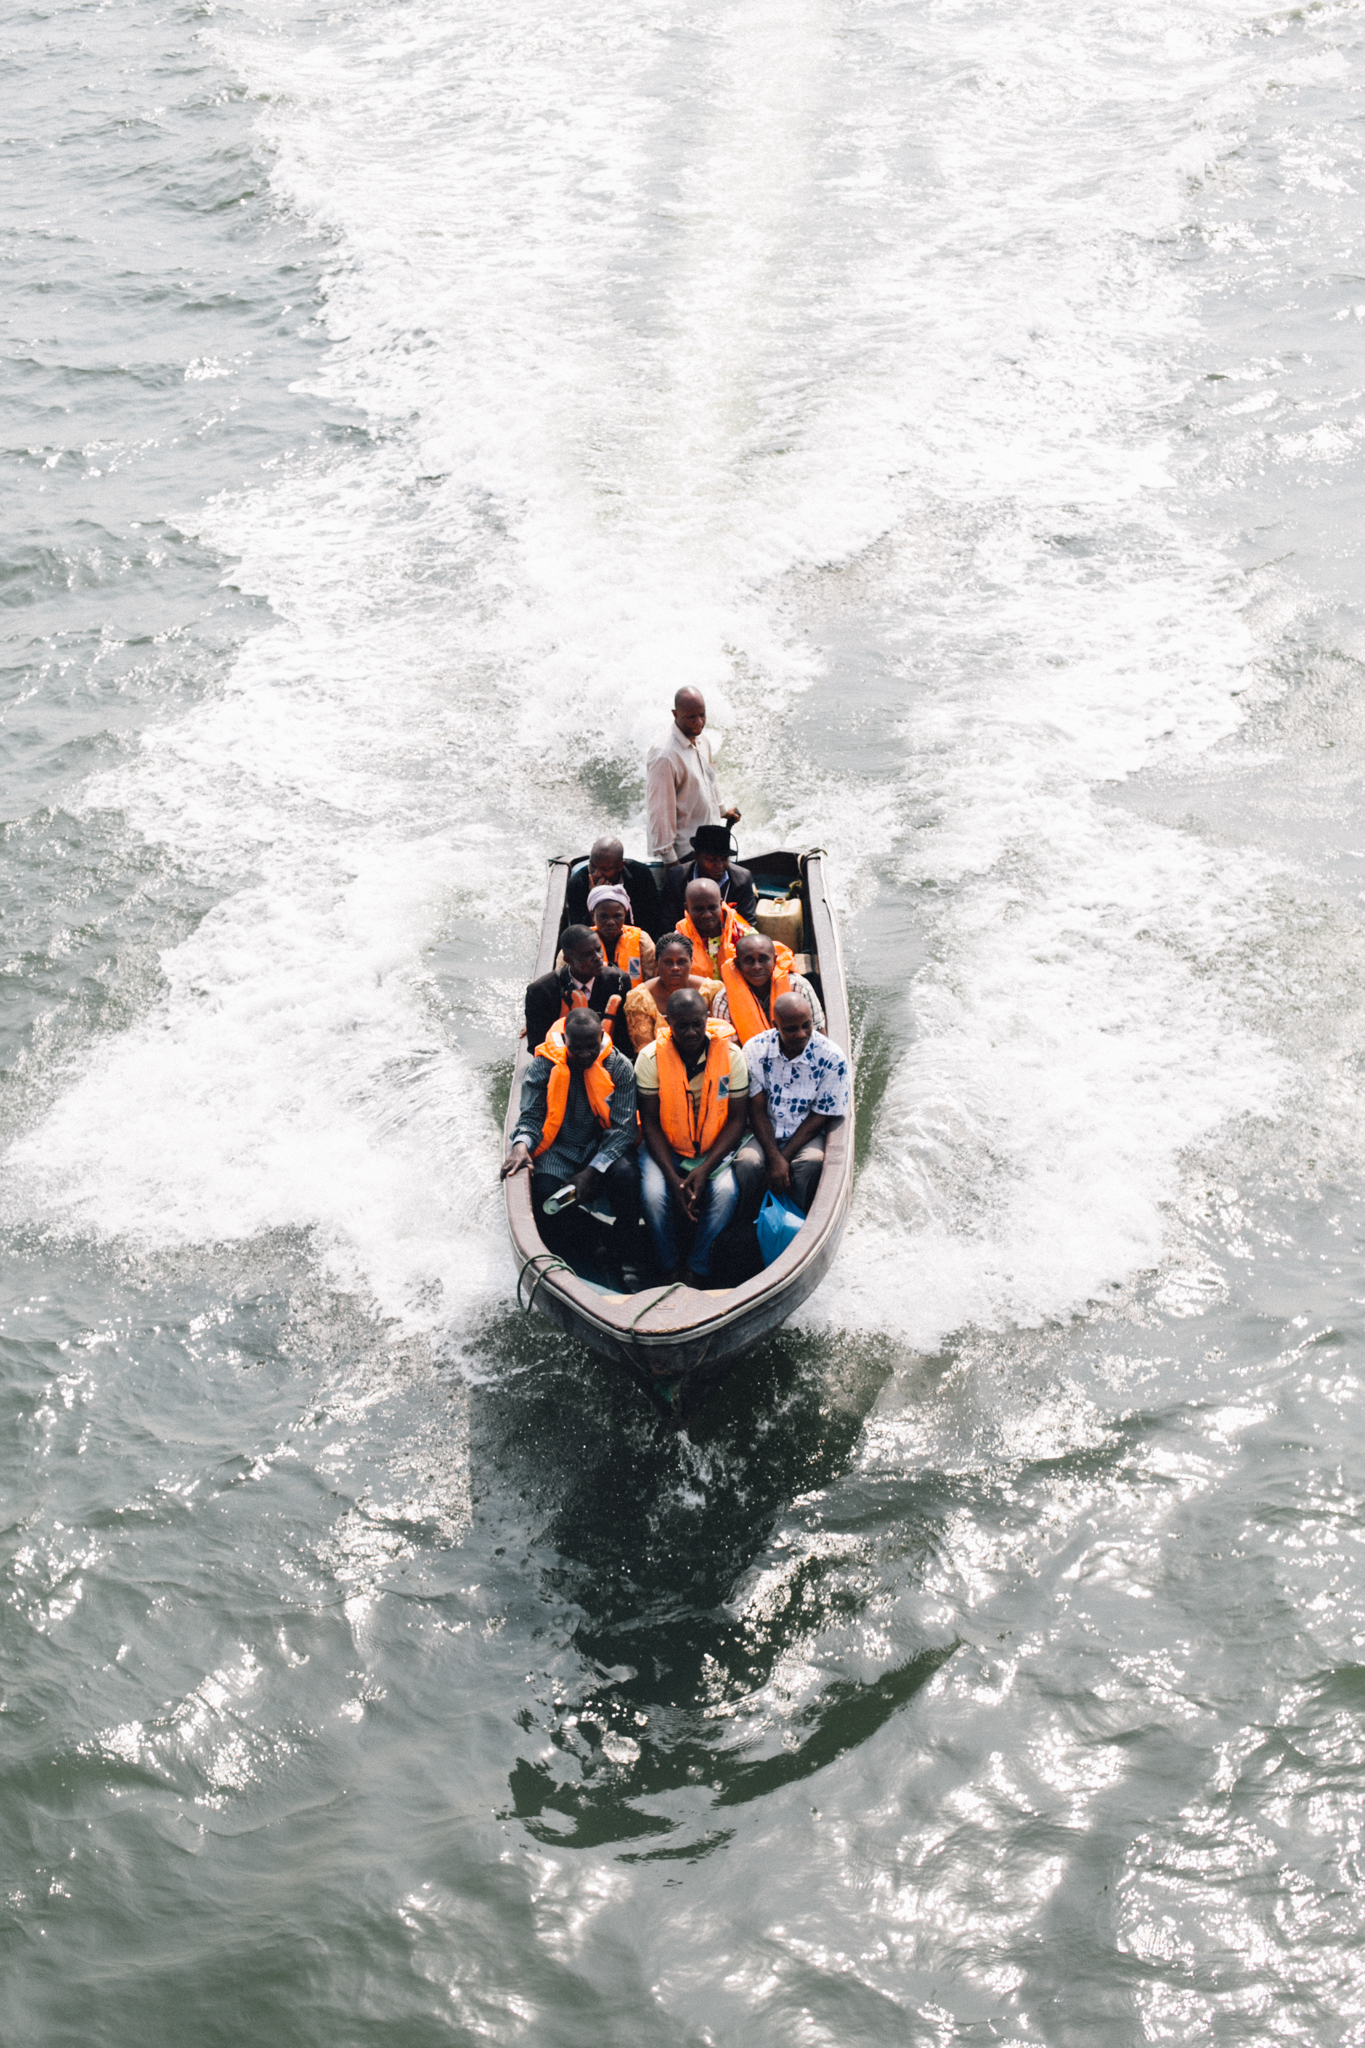 Speed Boat, Asarama, Andoni